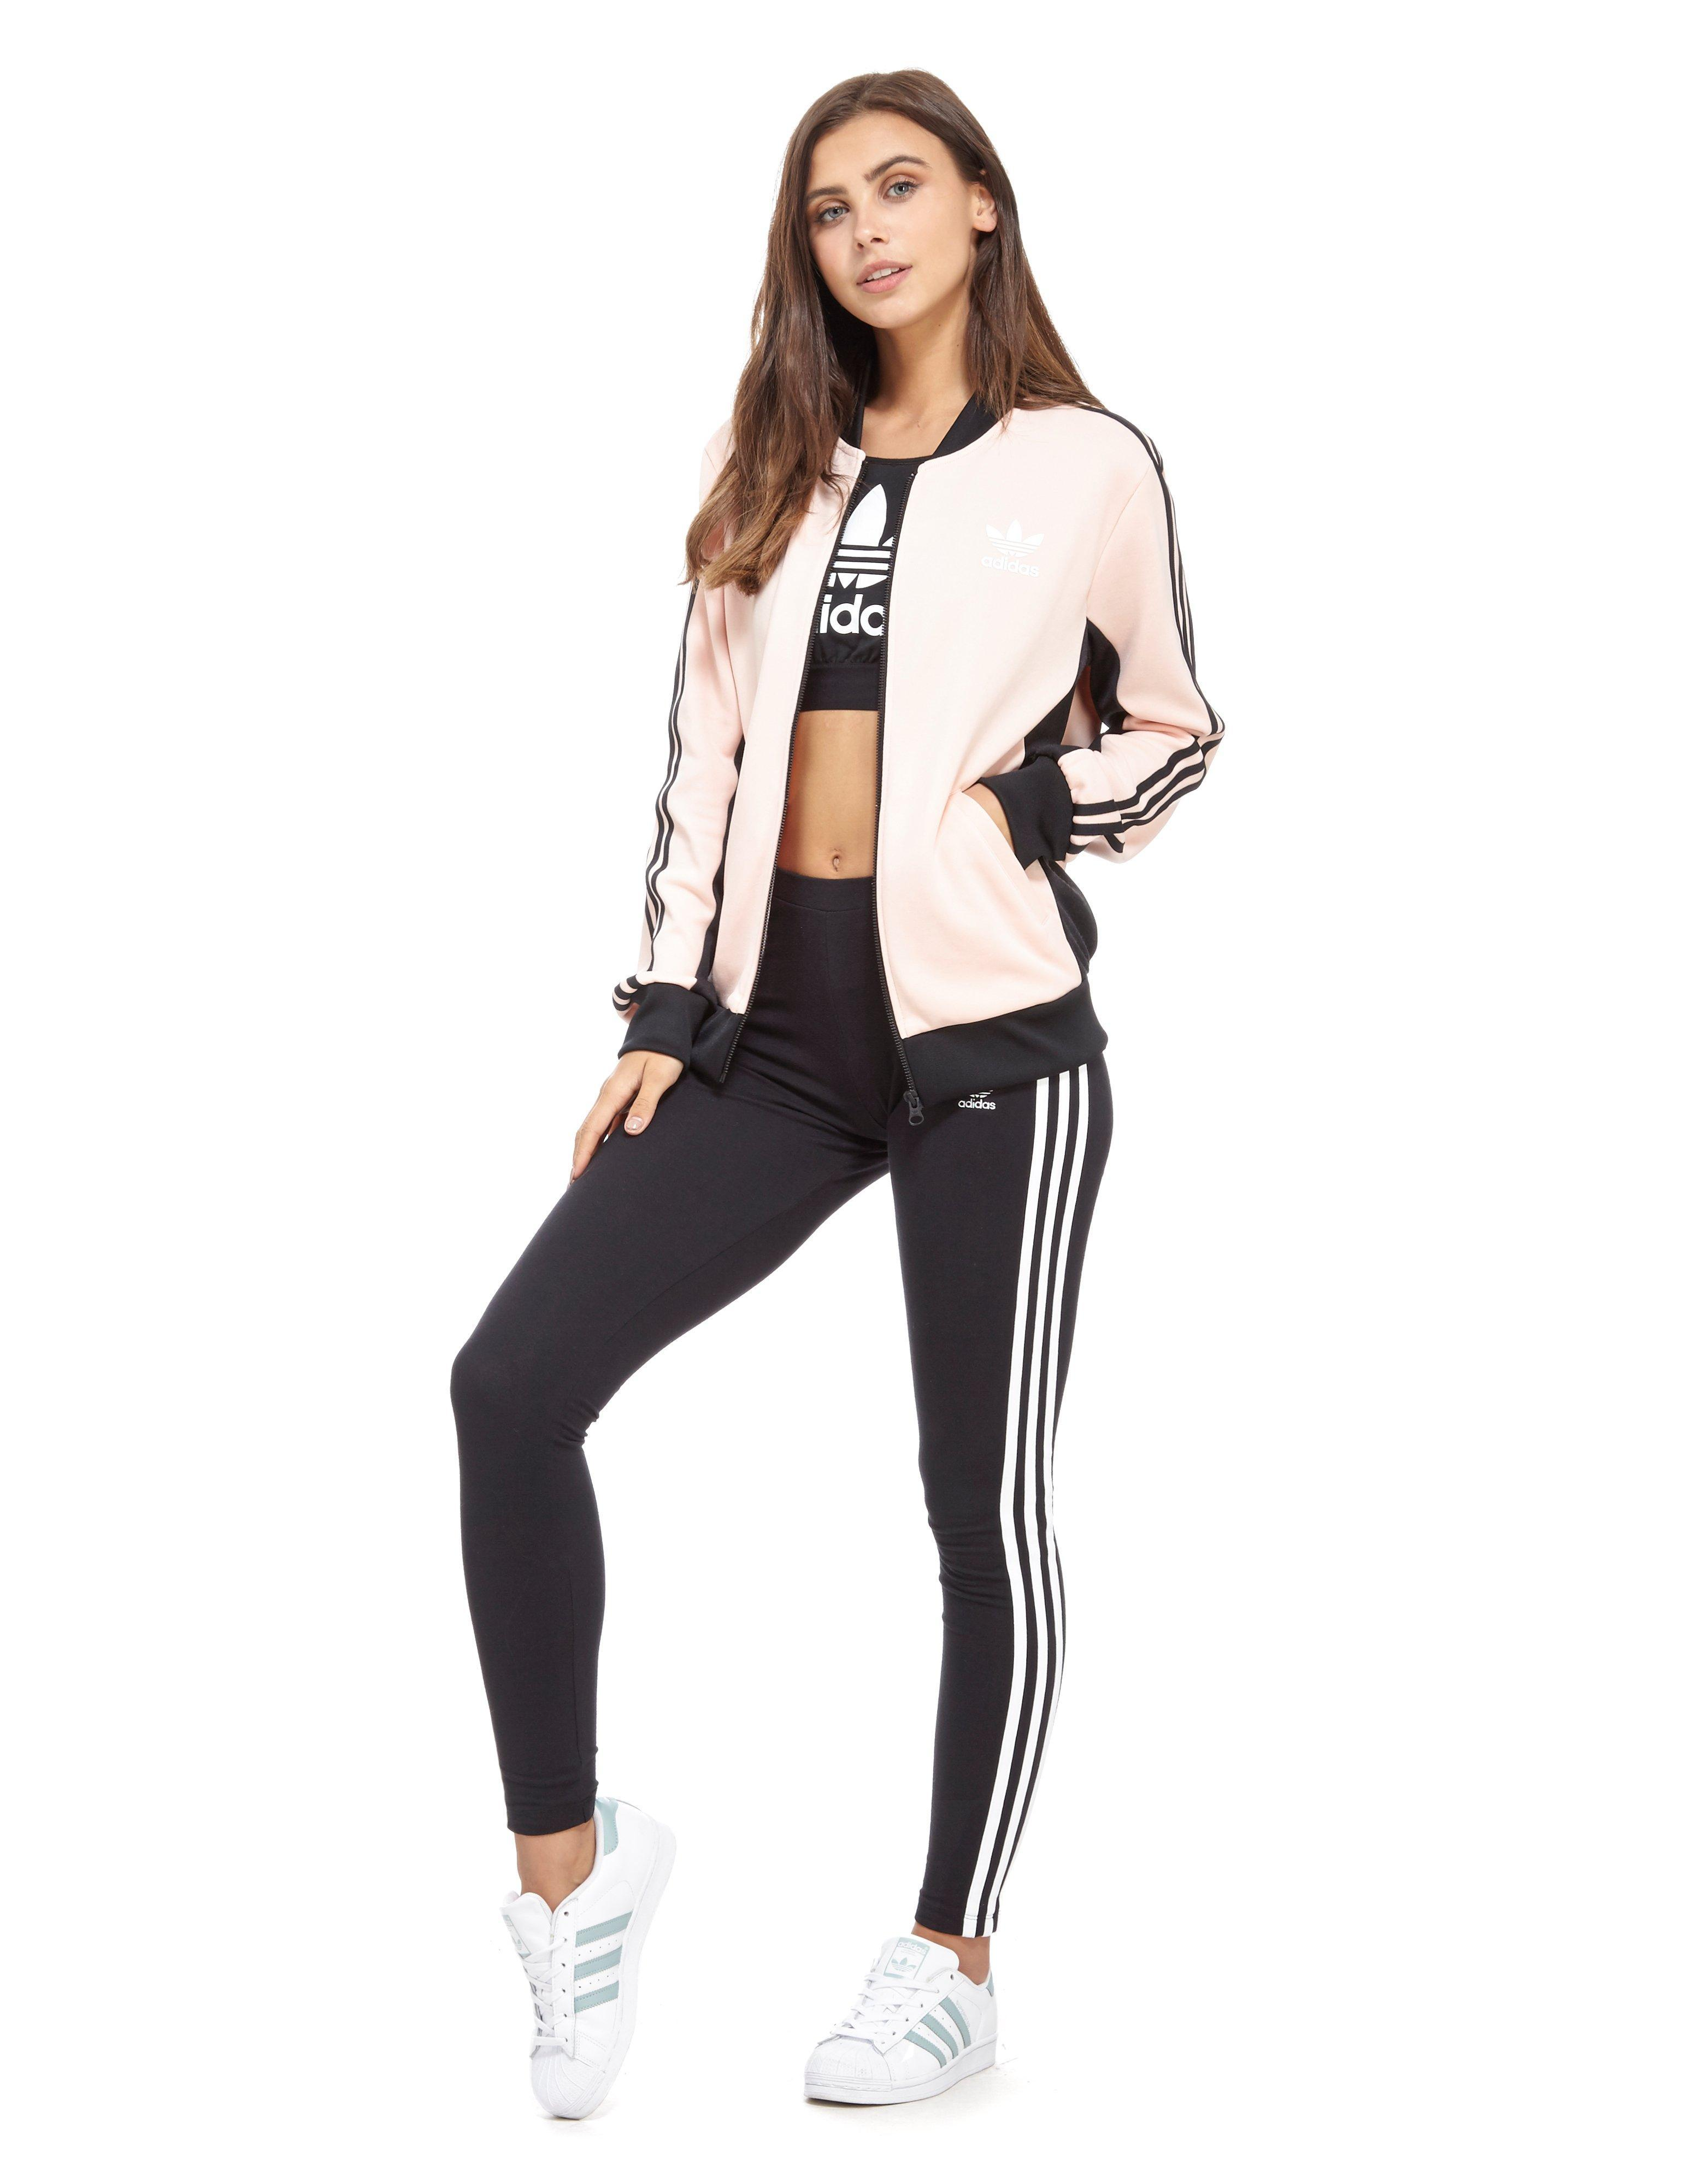 eecbe56e75a9 adidas Originals Supergirl Track Top in Pink - Lyst